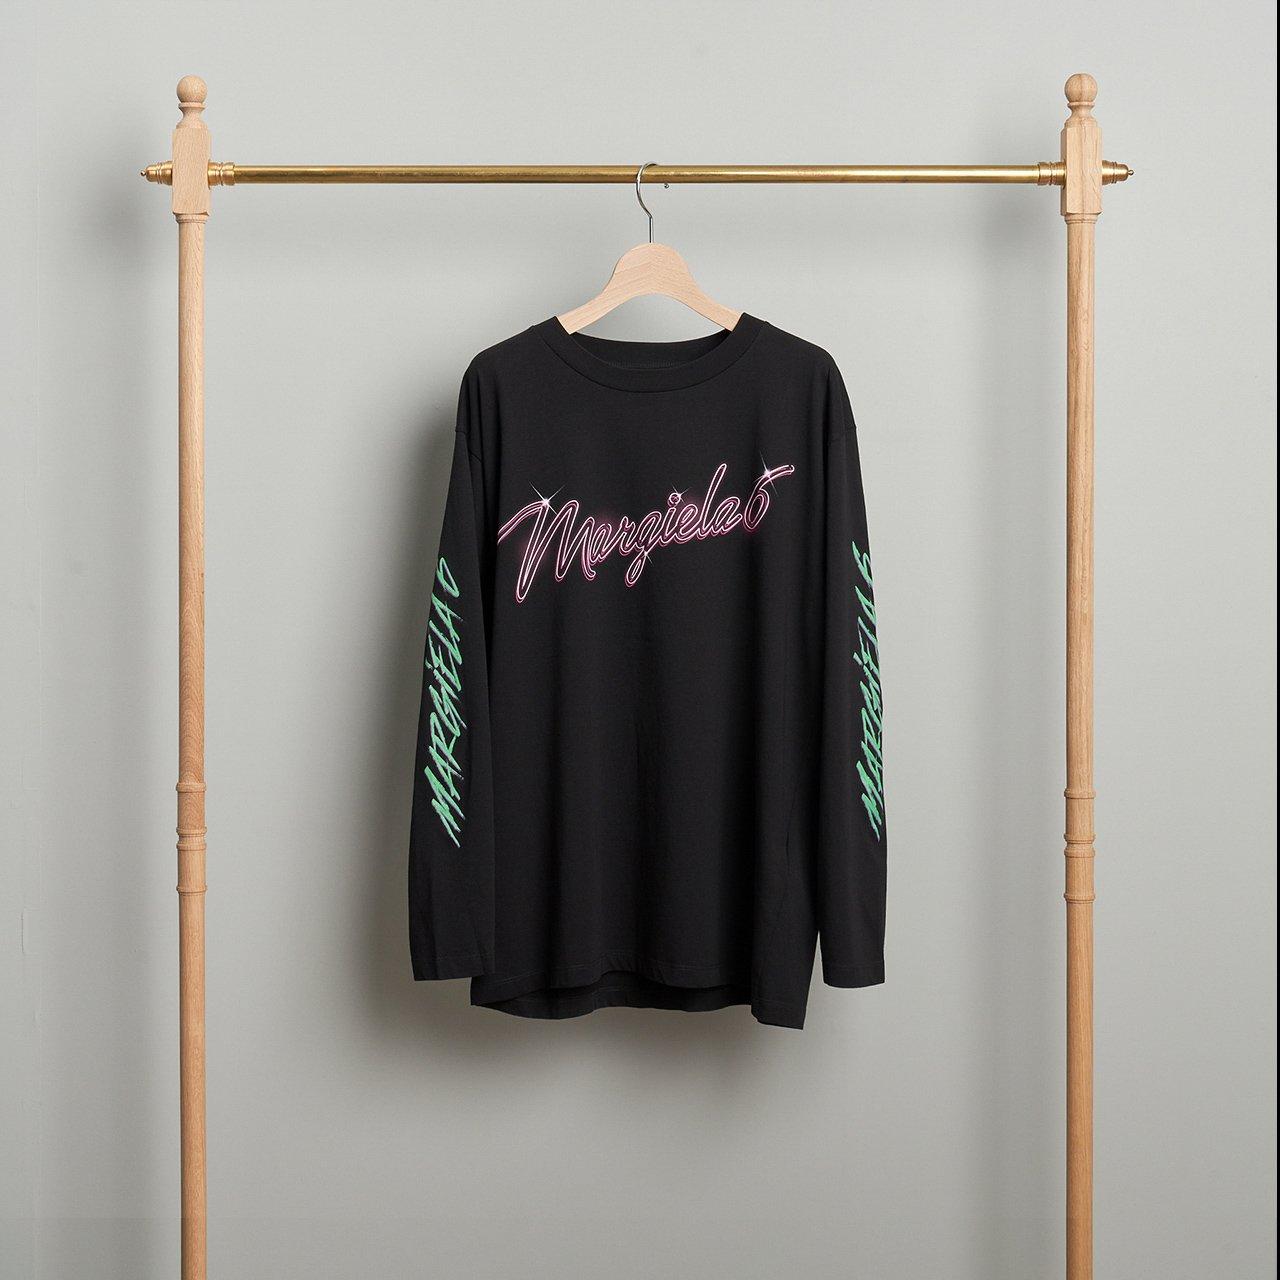 MM6 Maison Margiela PARIS <BR>ロゴ 長袖Tシャツ<BR>BLACK